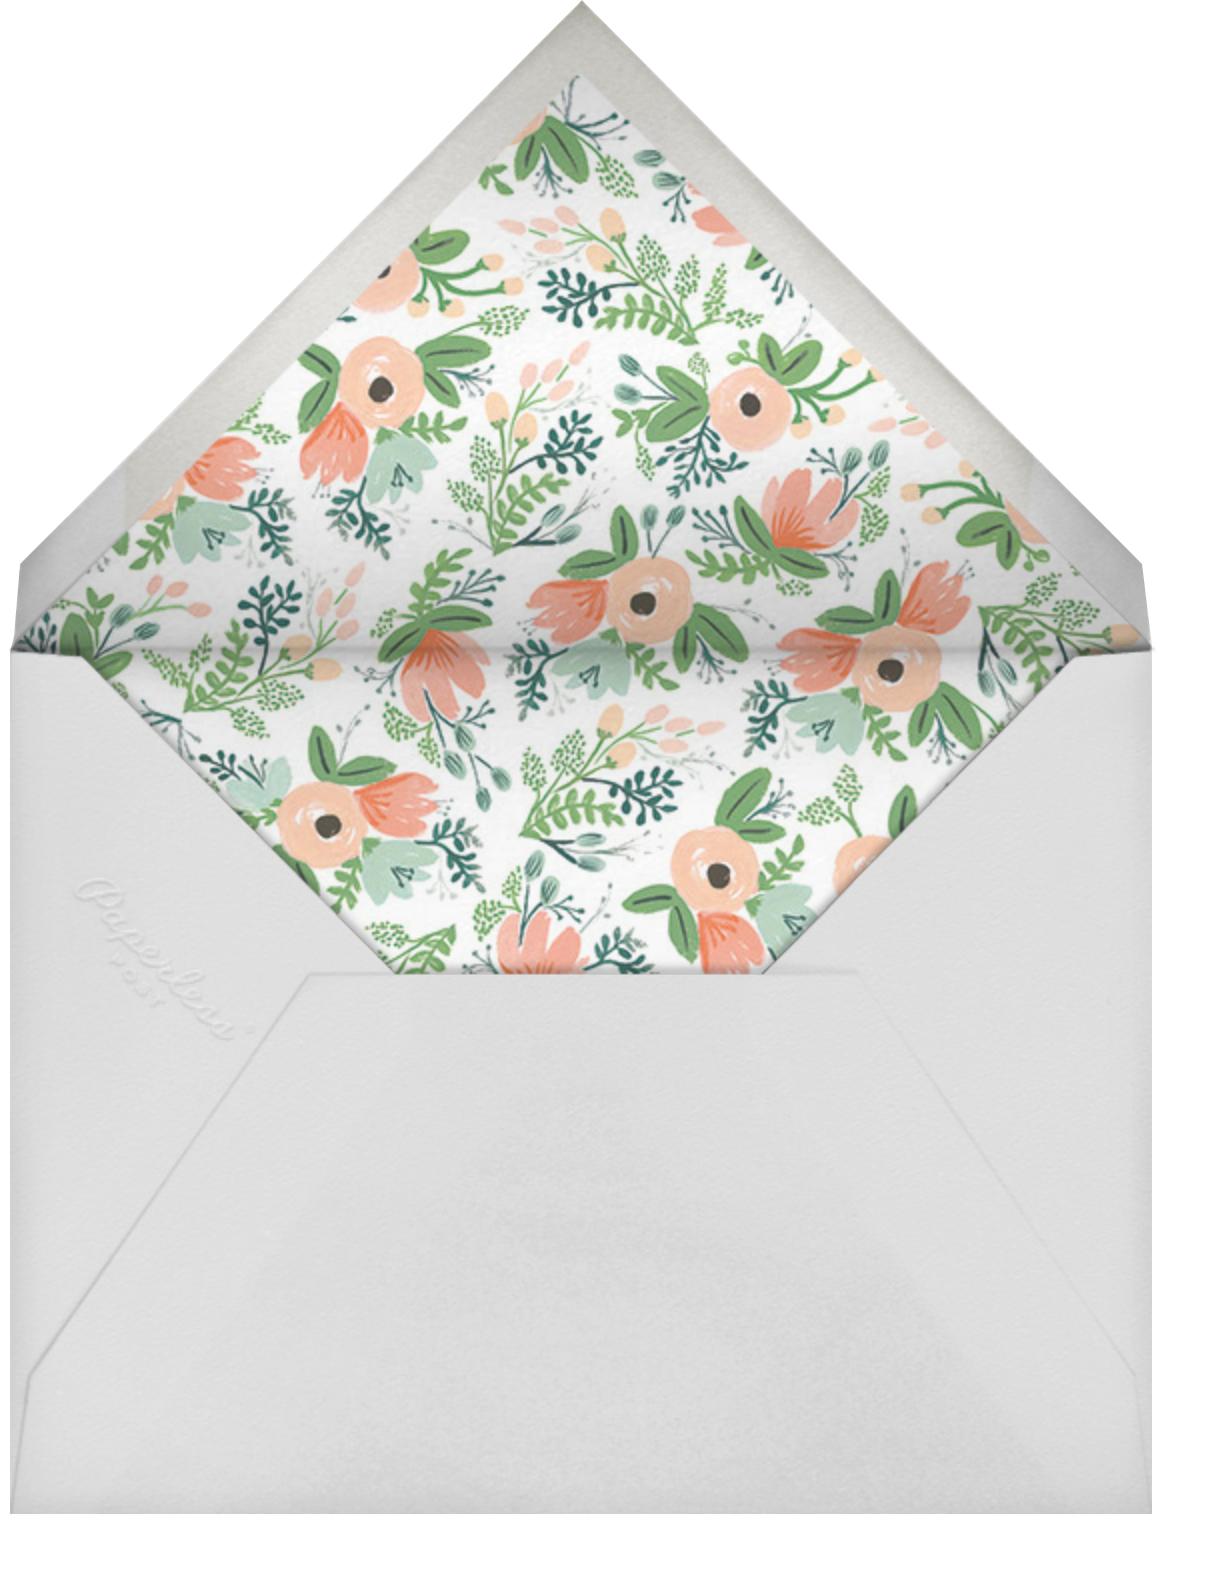 Floral Silhouette (Portrait Photo) - White/Silver - Rifle Paper Co. - Wedding - envelope back